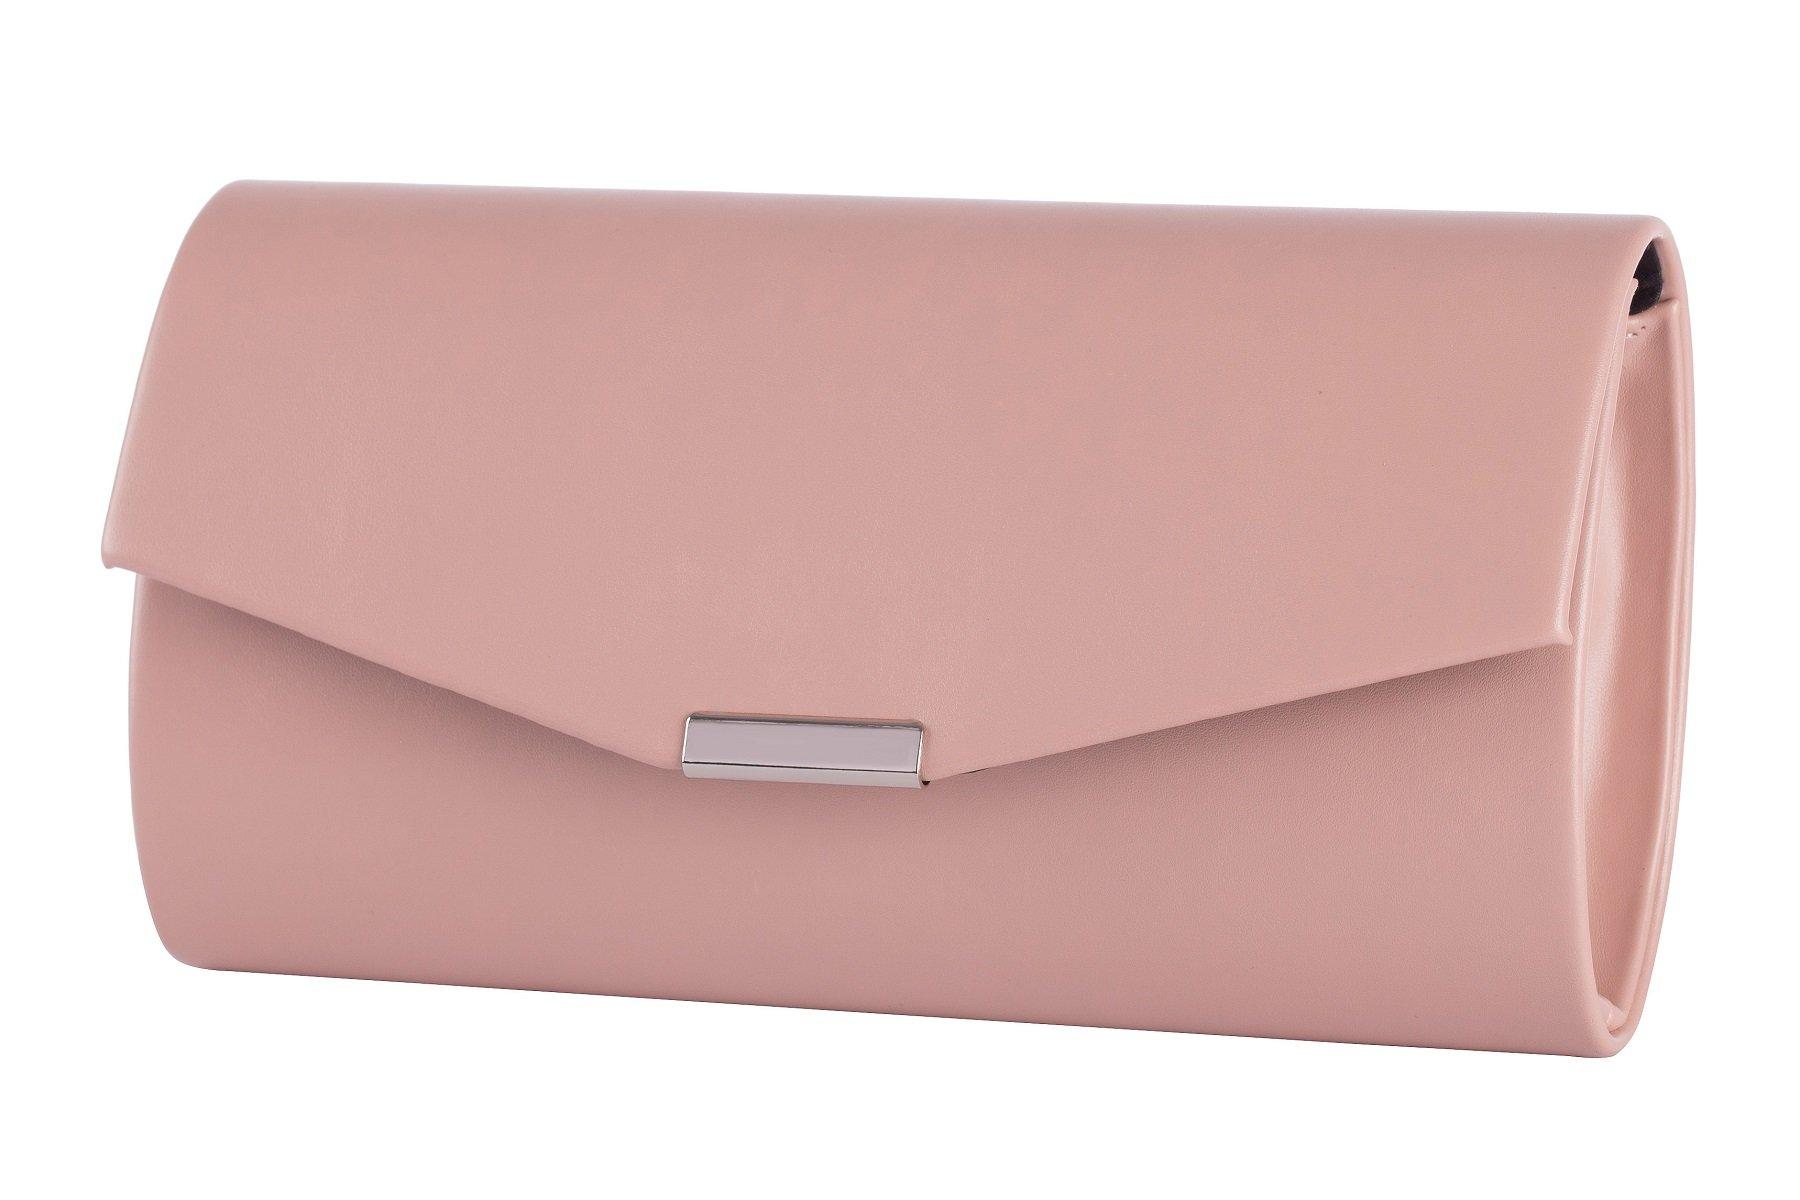 1ca10d825ff57 Klasyczna wizytowa torebka kopertówka - MB CLASSIC BAG